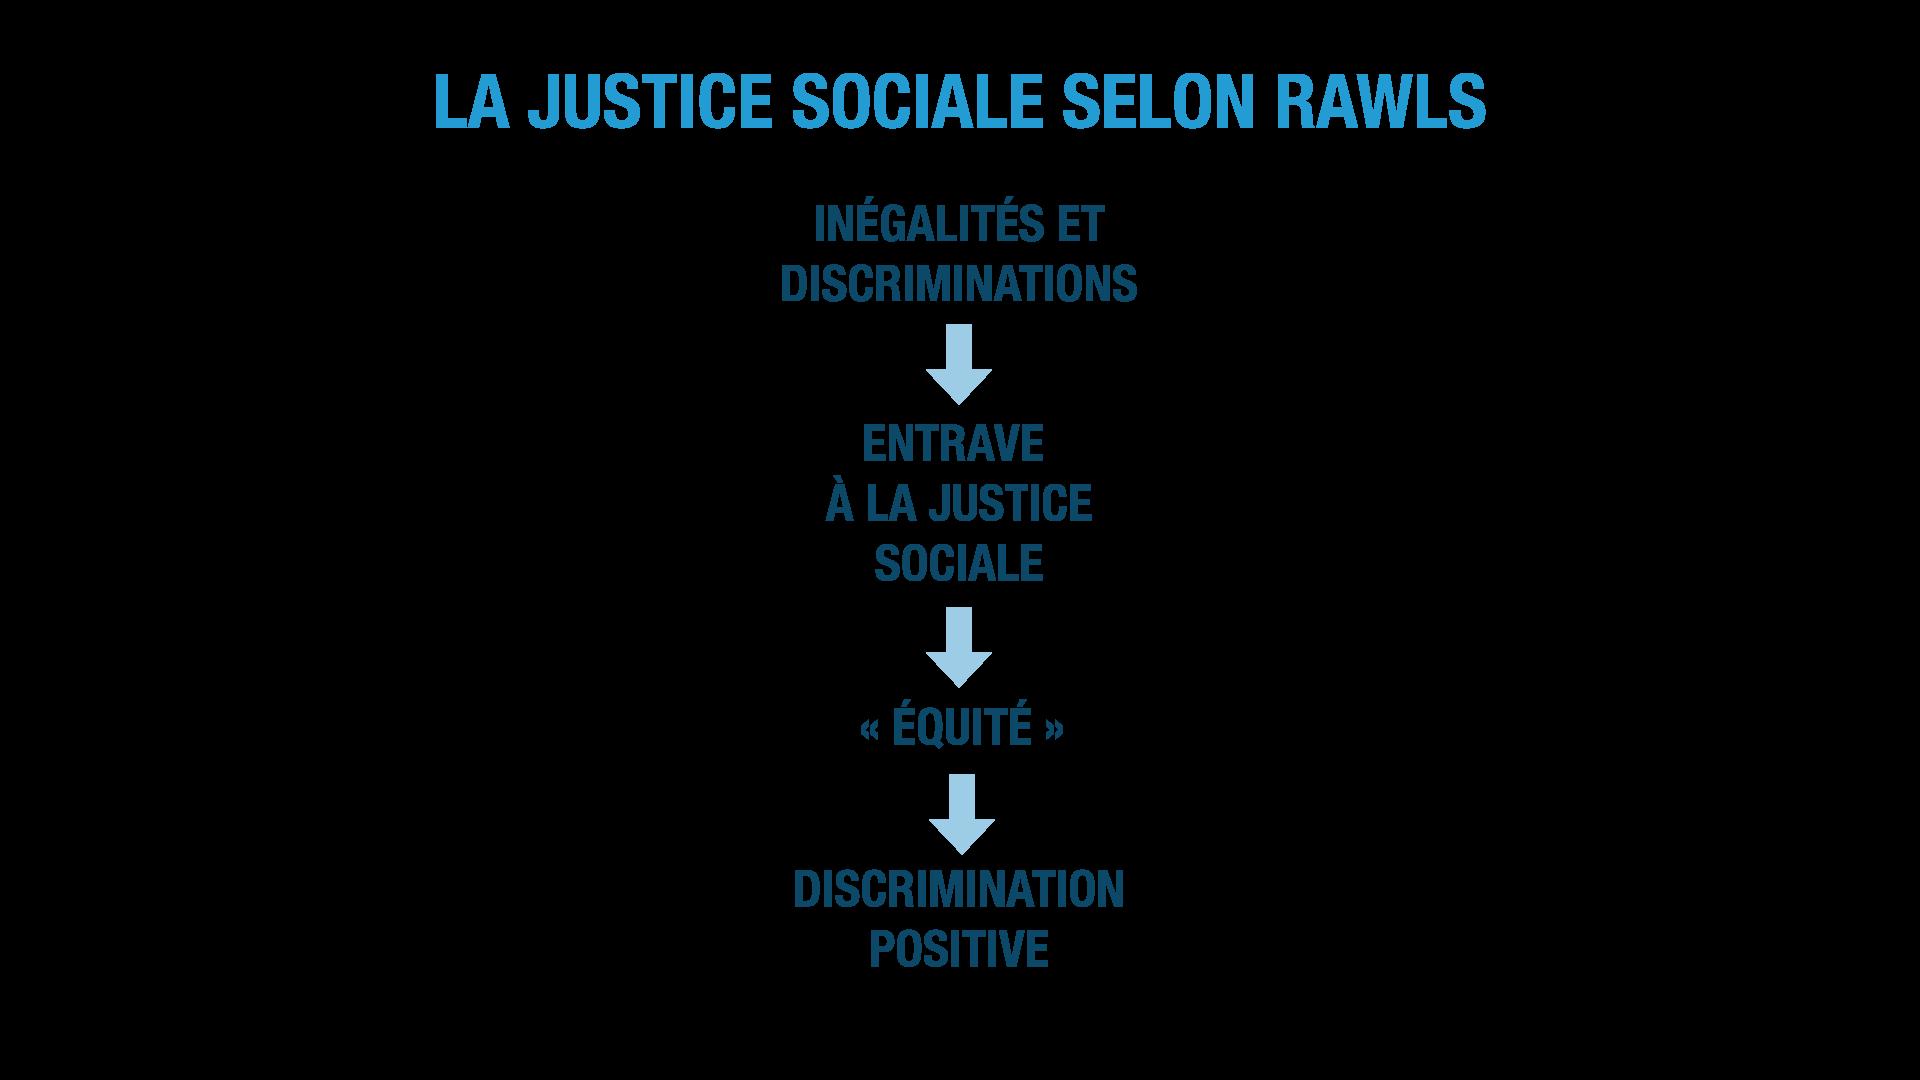 La justice sociale selon Rawls ses terminale